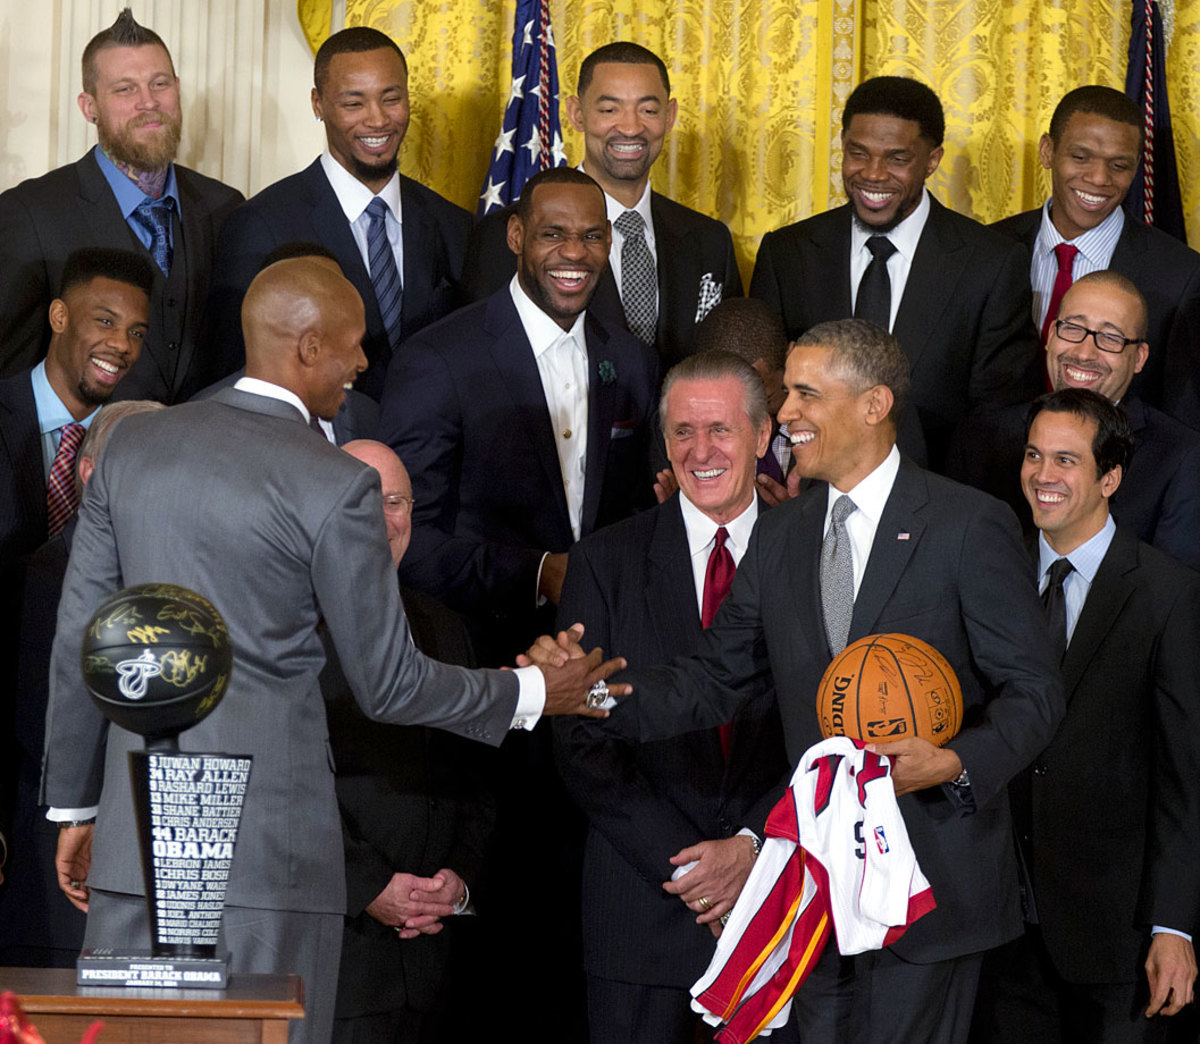 2014-0114-Miami-Heat-Ray-Allen-Barack-Obama.jpg